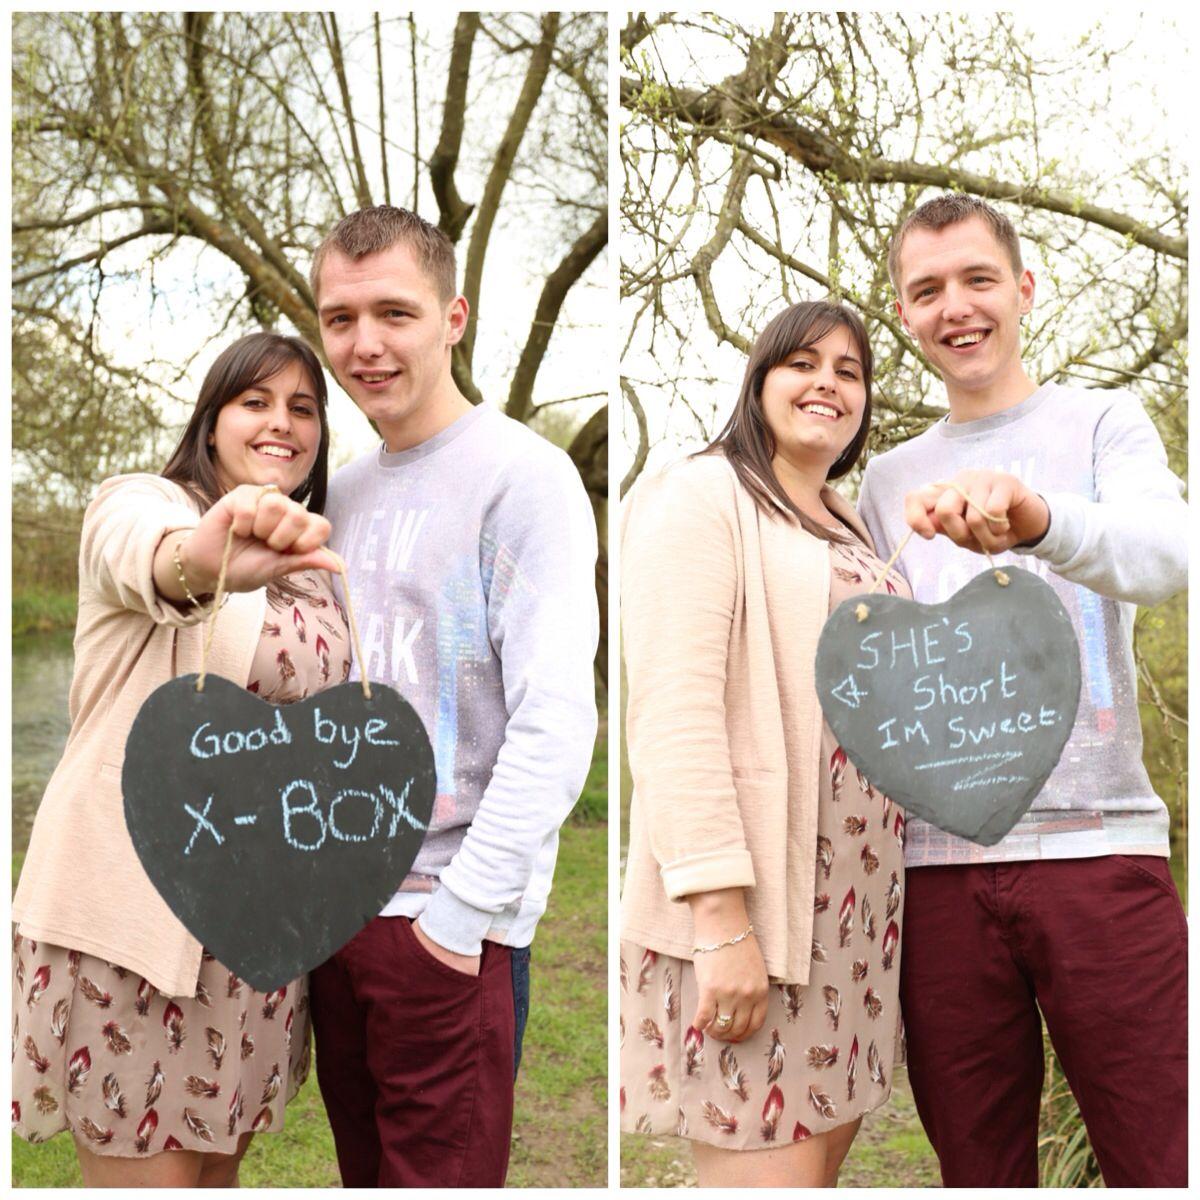 Goodbye xbox, she's short I'm sweet Wedding photo booth